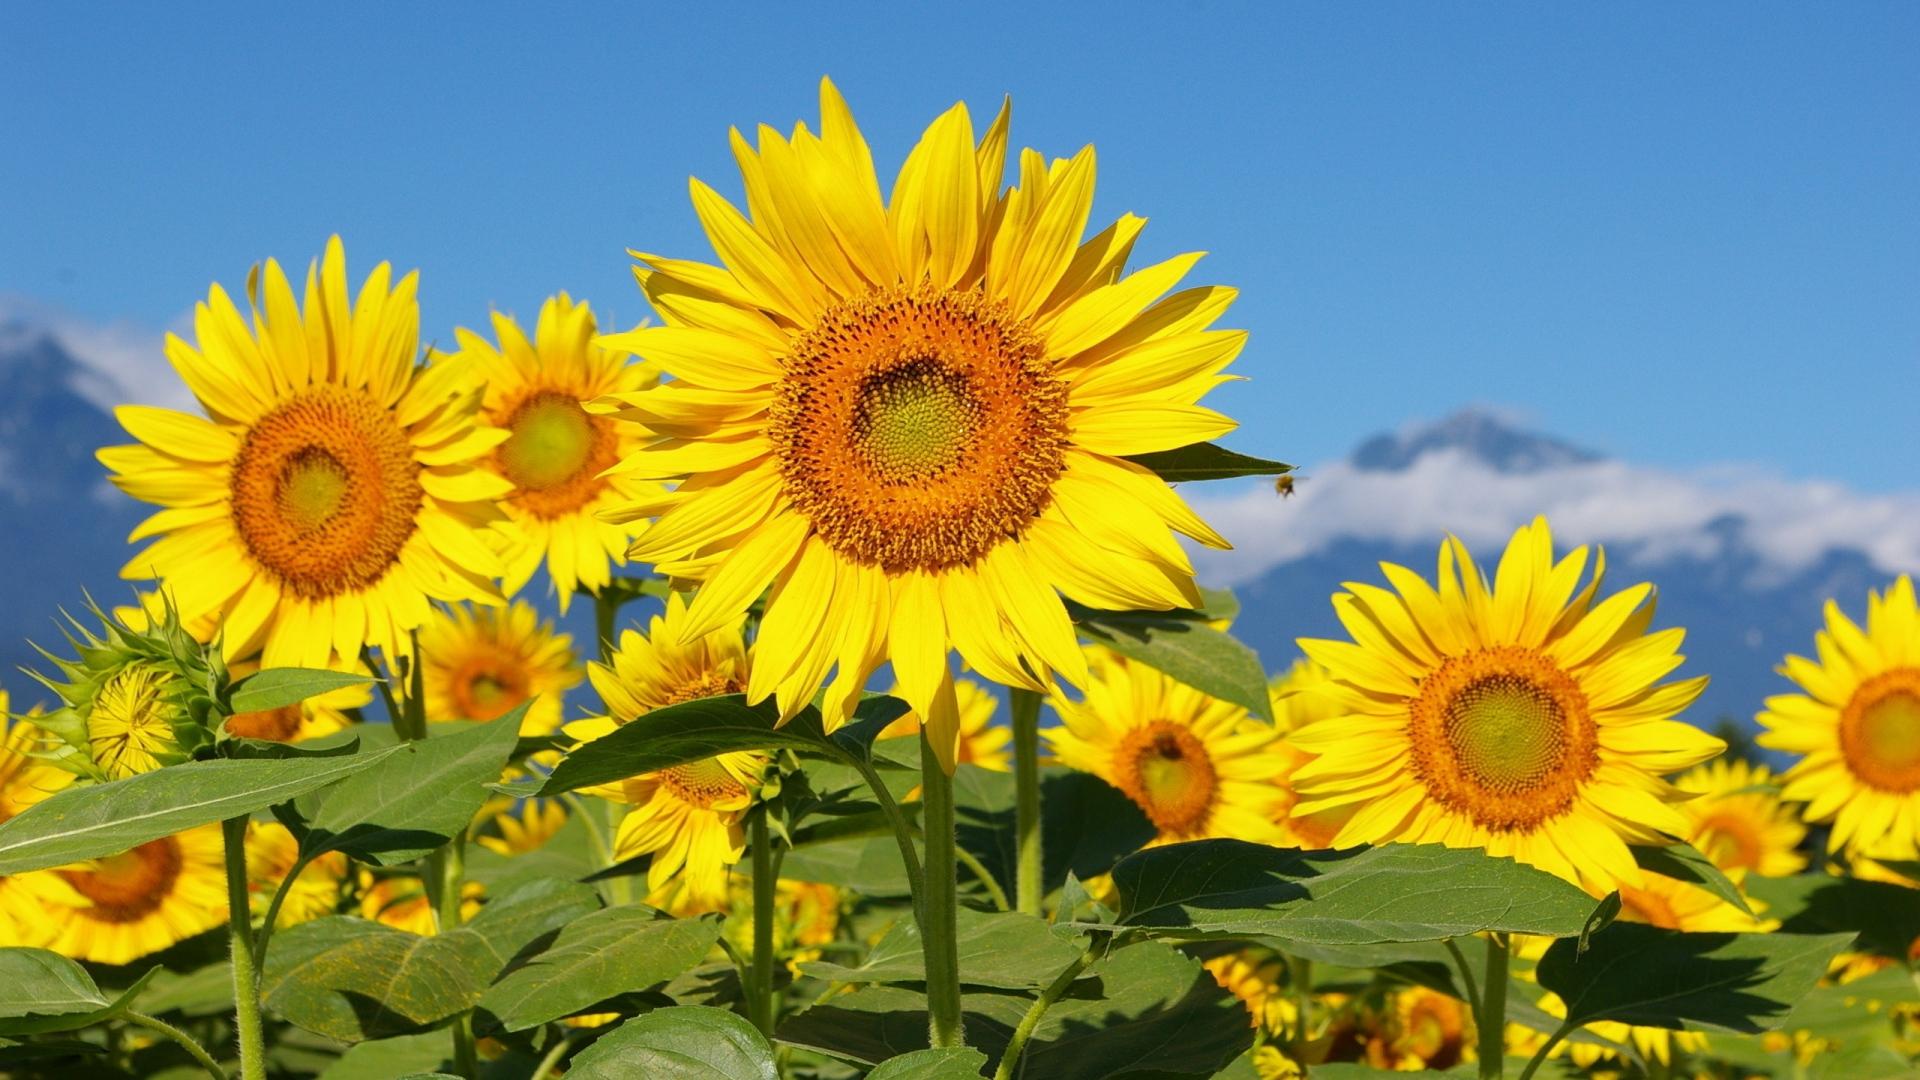 Download Wallpaper 1920x1080 Sunflowers Field Sun Sky Mountains Full Hd 1080p Hd Background